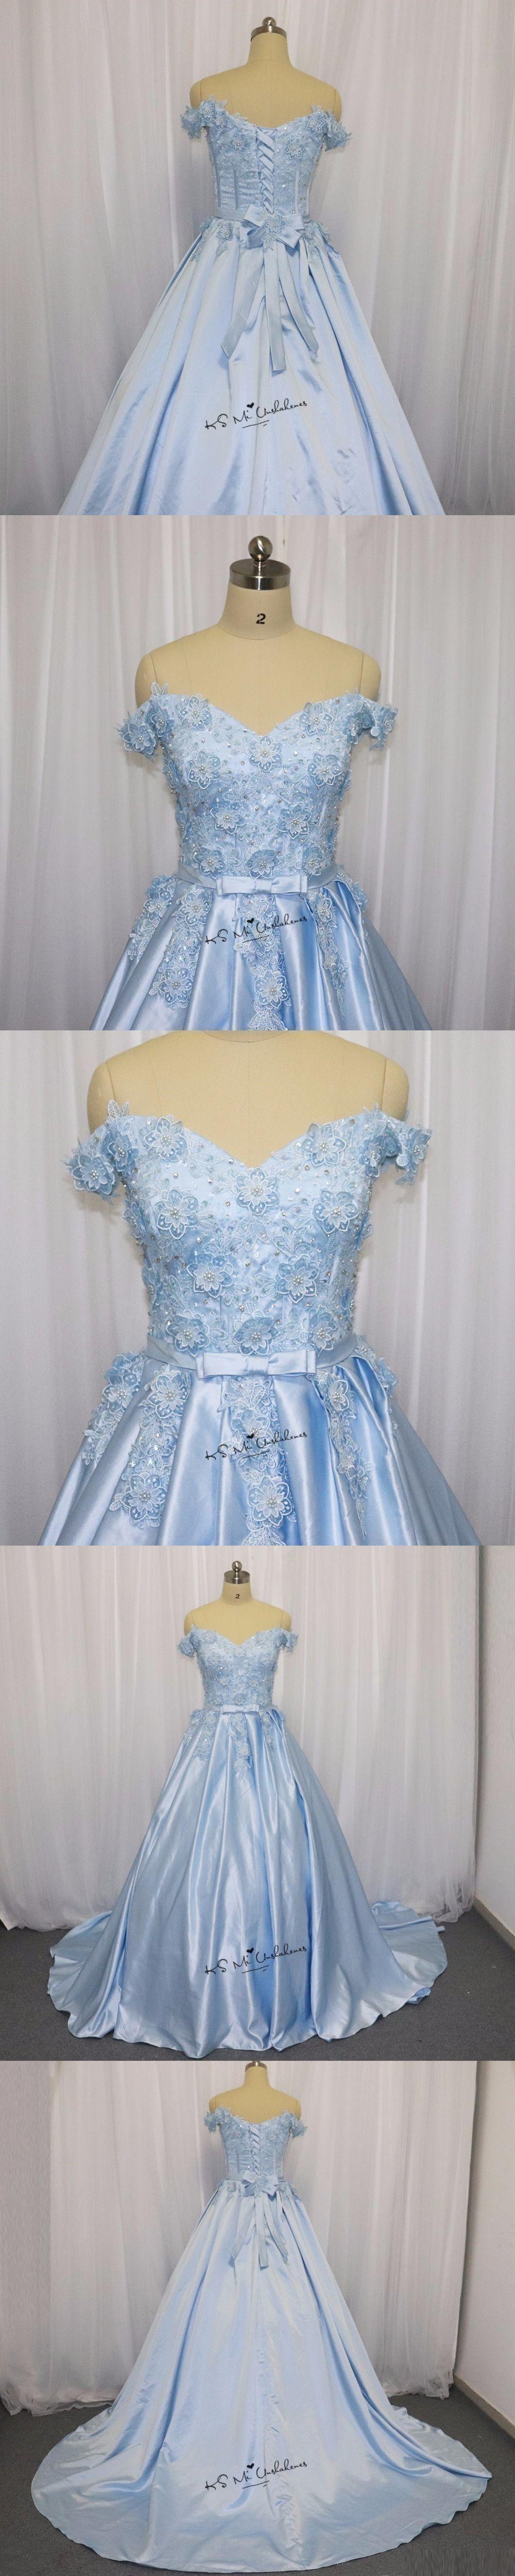 Ice blue wedding dress vintage flowers pearls lace china bridal